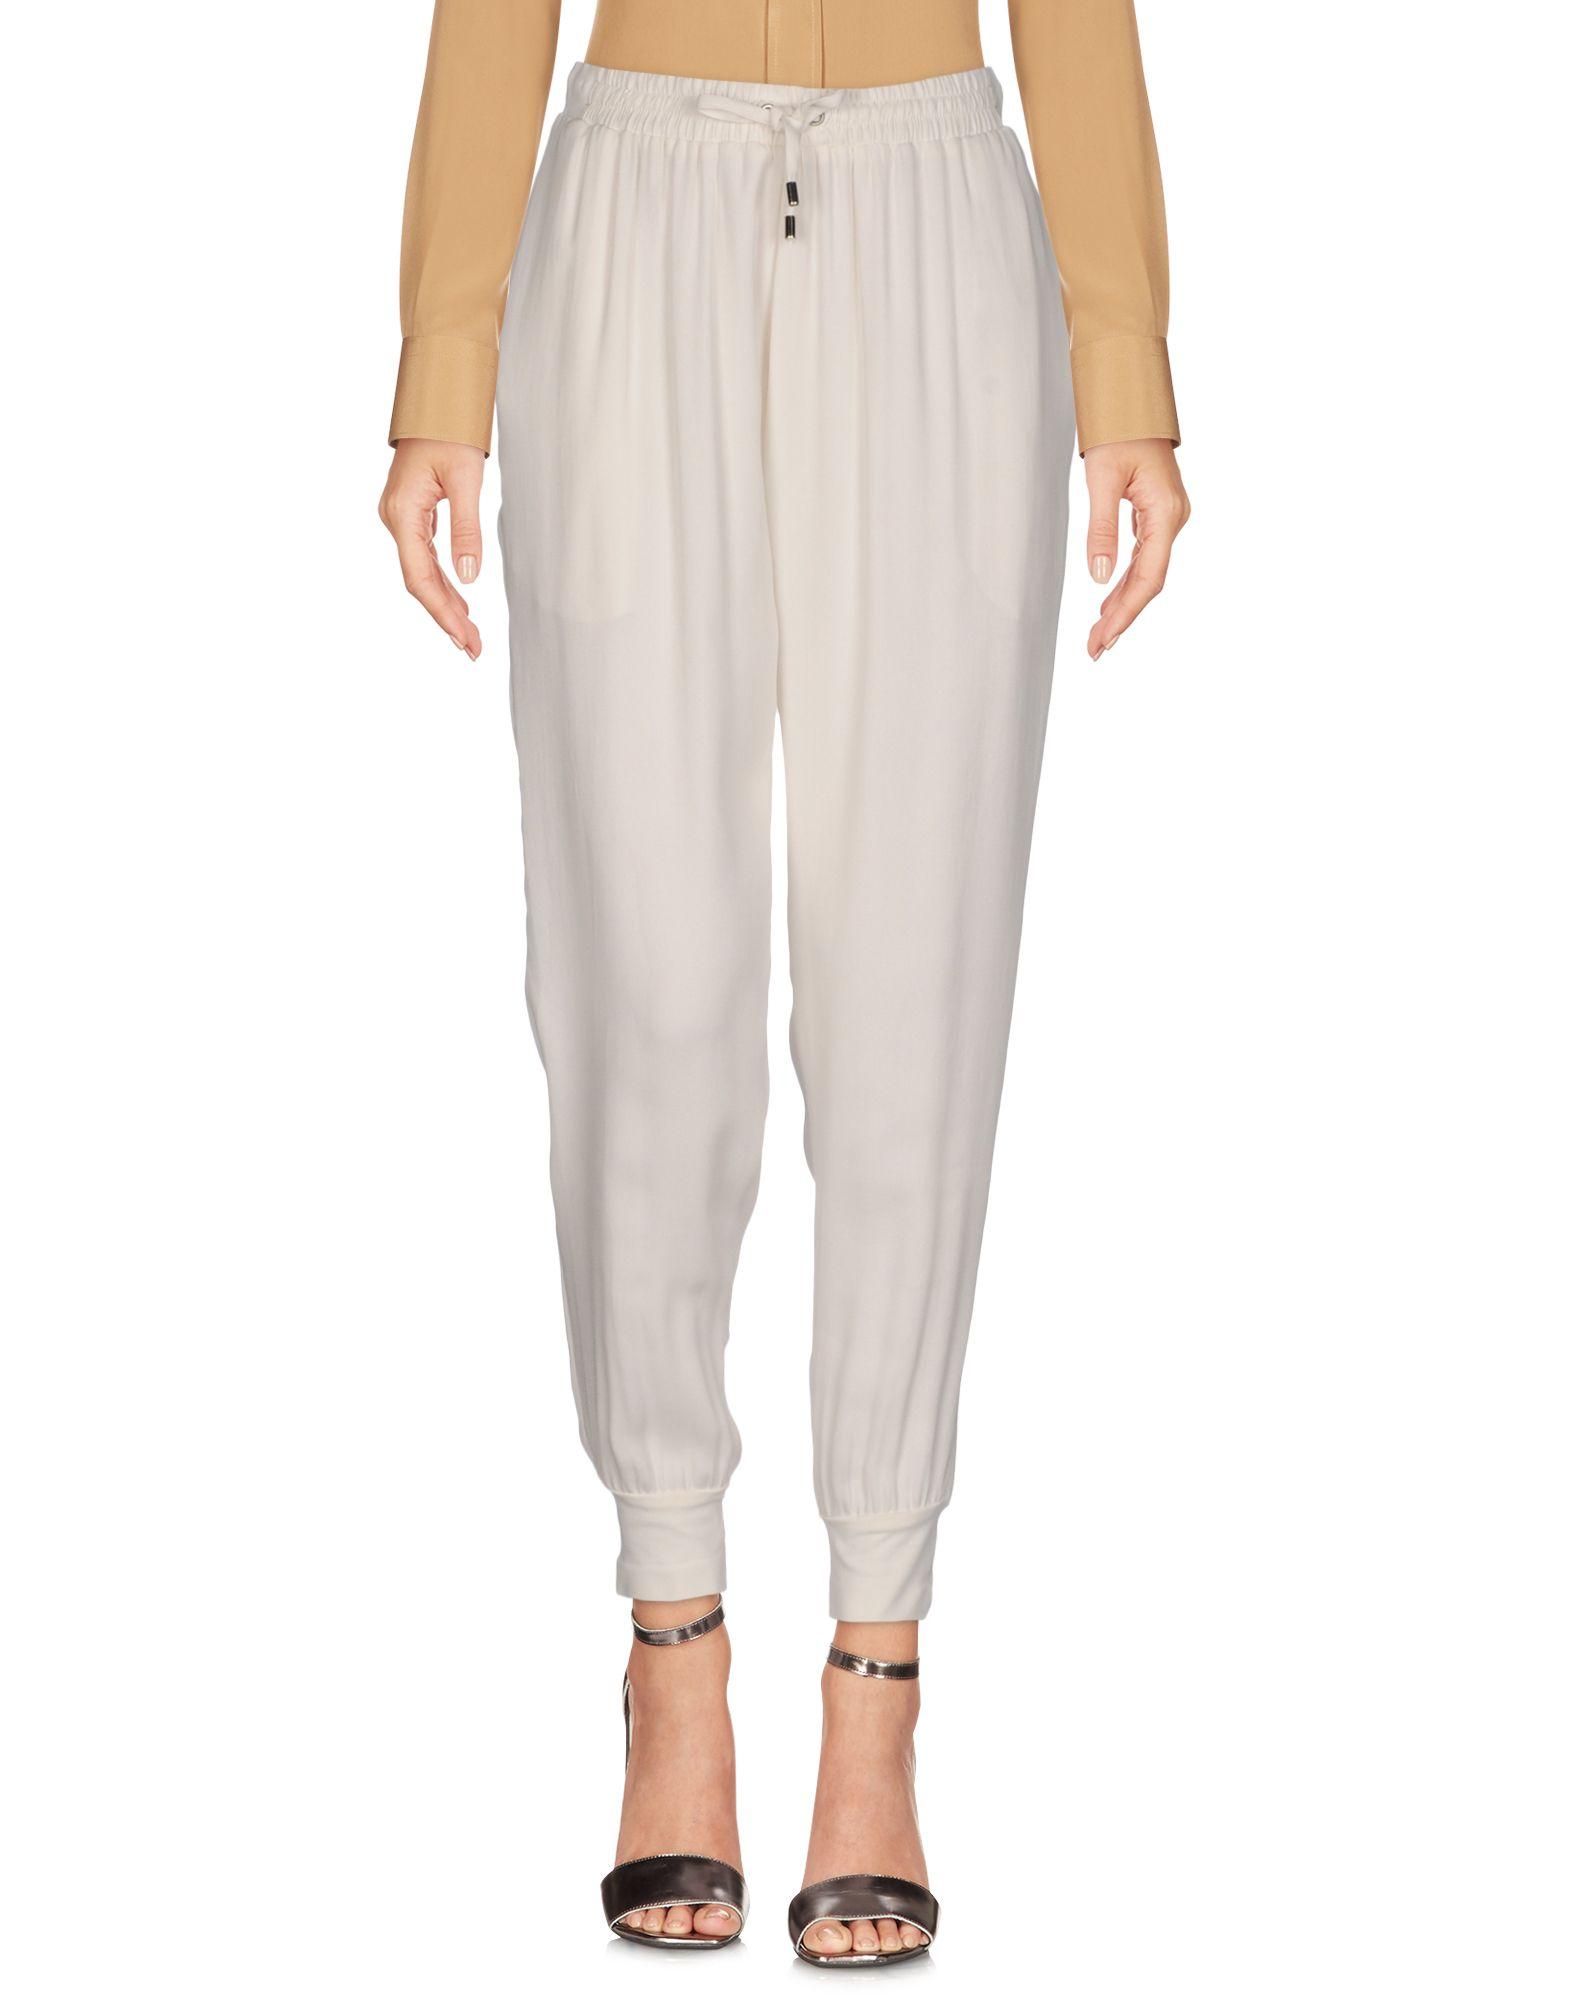 PLEIN SUD Повседневные брюки [100%] the new imported genuine 6mbp50rh060 01 6mbp50rta060 01 billing